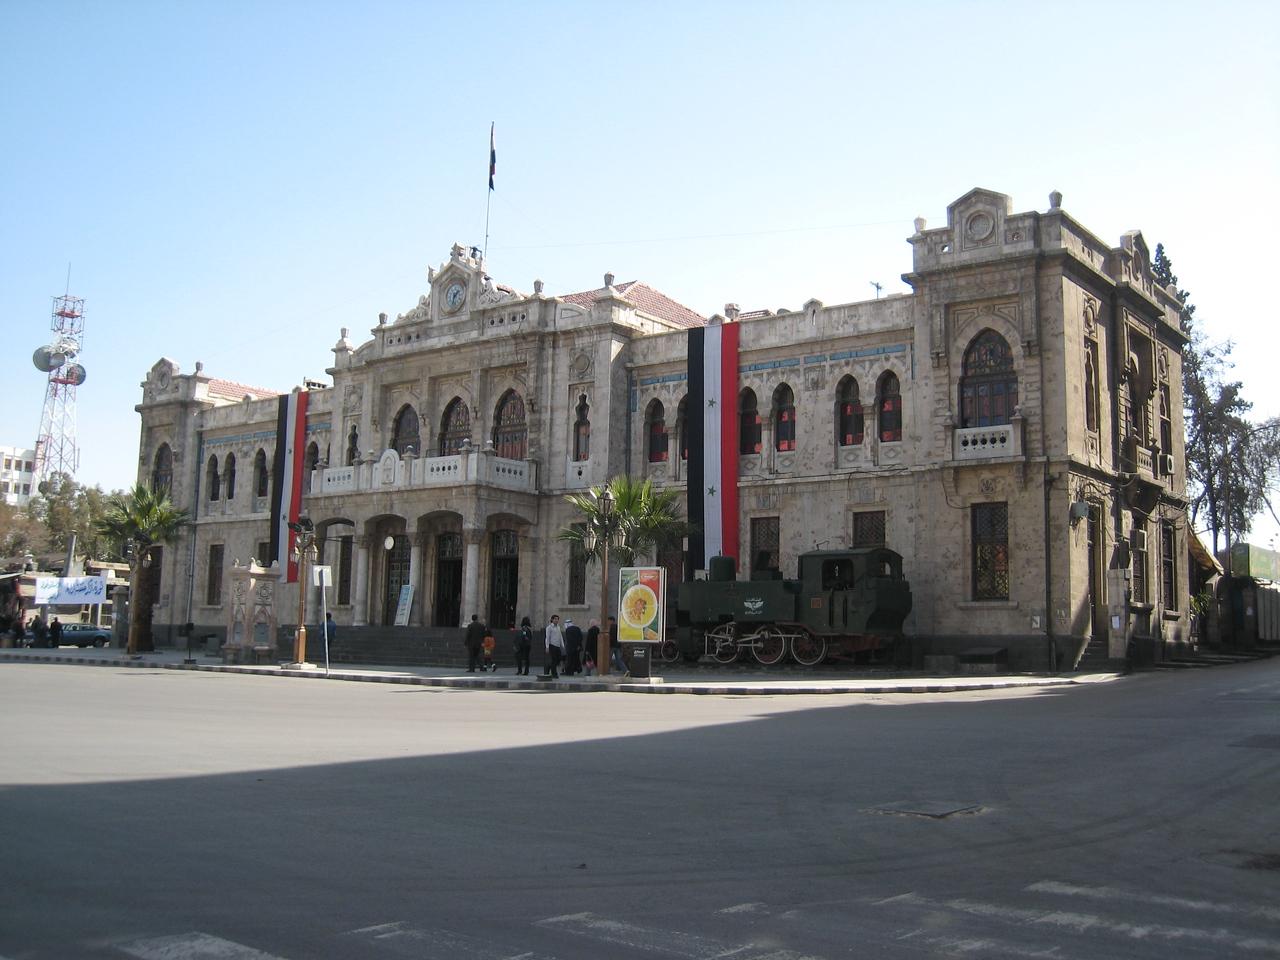 Hejaz railway station, currently under restoration.